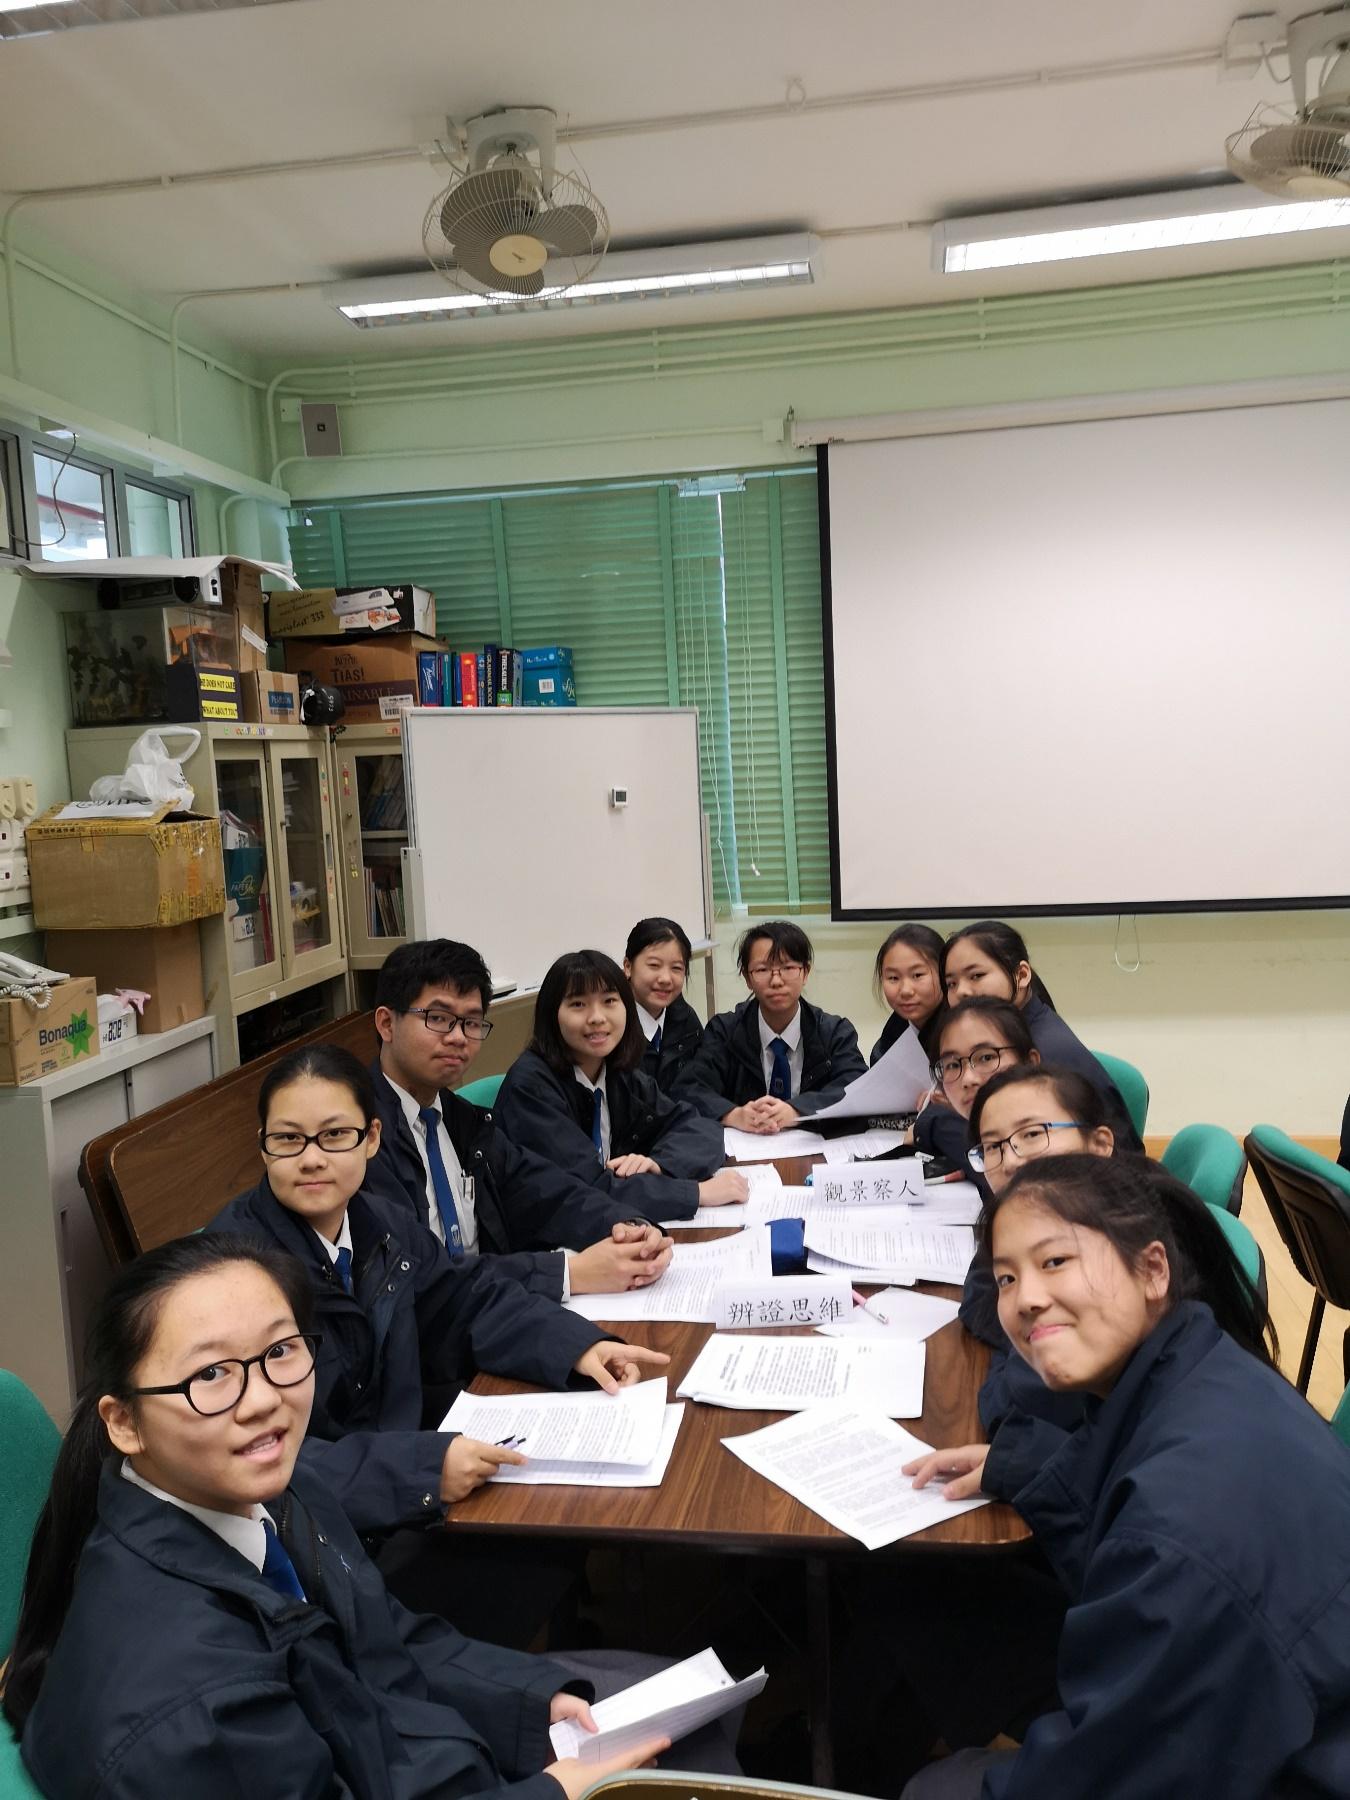 http://npc.edu.hk/sites/default/files/img_20190225_164837.jpg